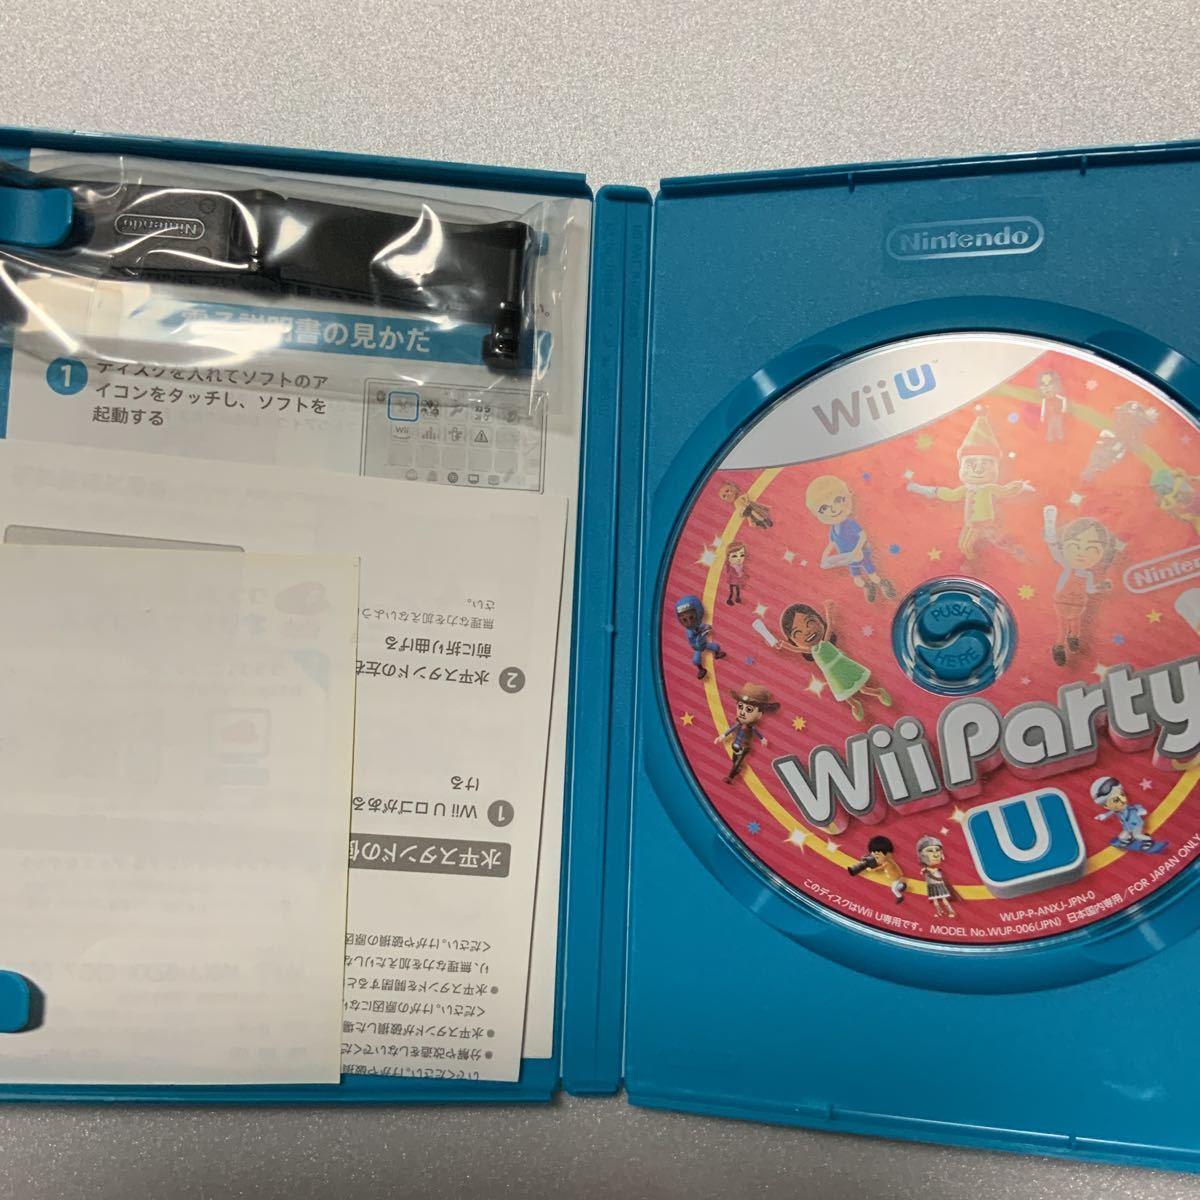 WiiパーティU Wii Party U WiiU _画像3